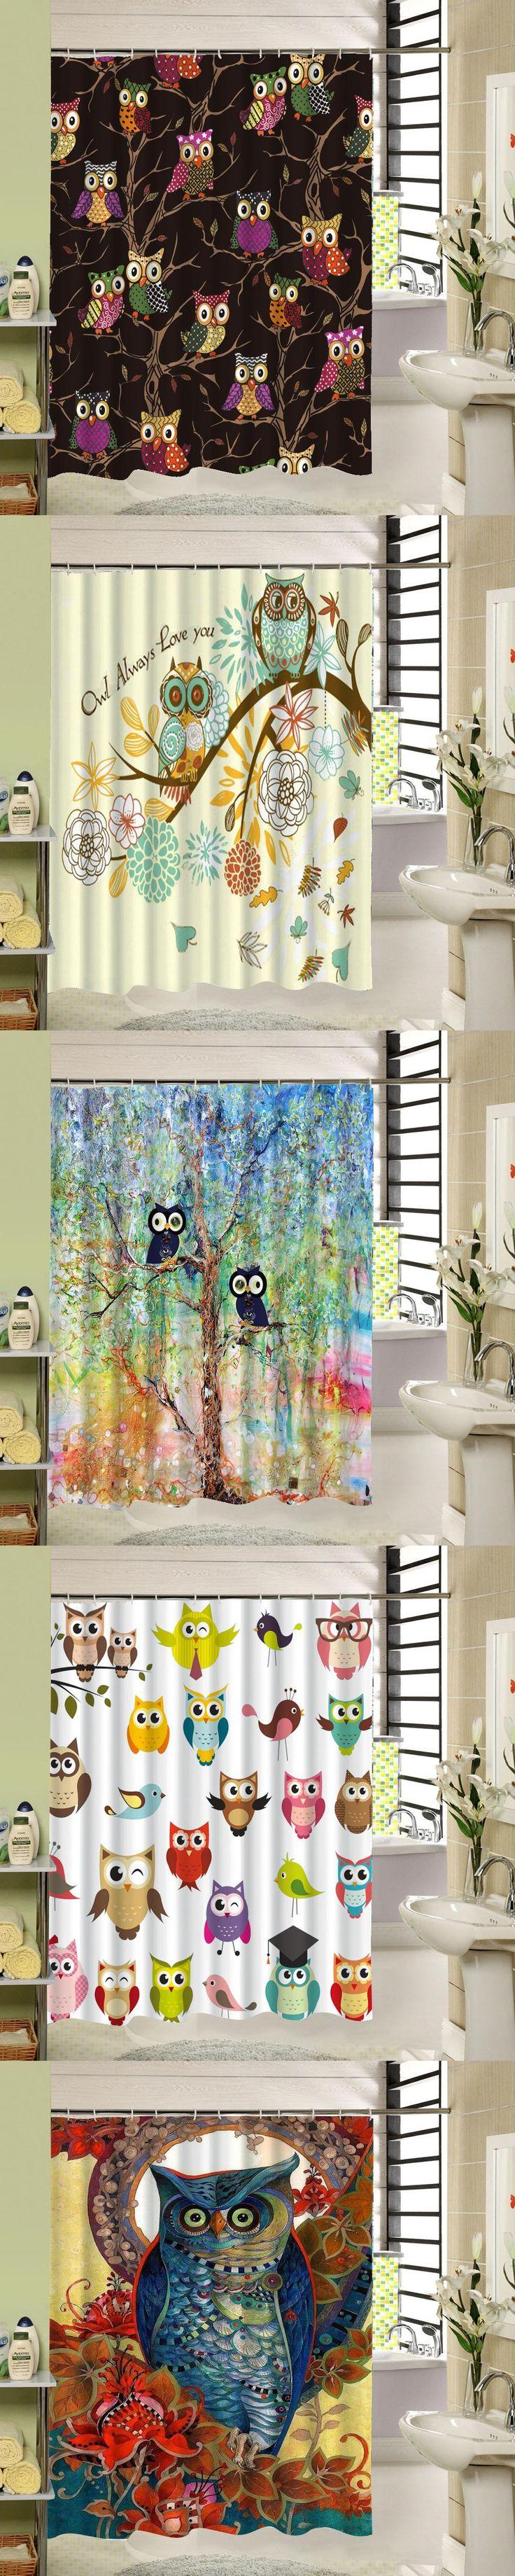 Best 25+ Bathroom shower curtain sets ideas on Pinterest   Boys ...